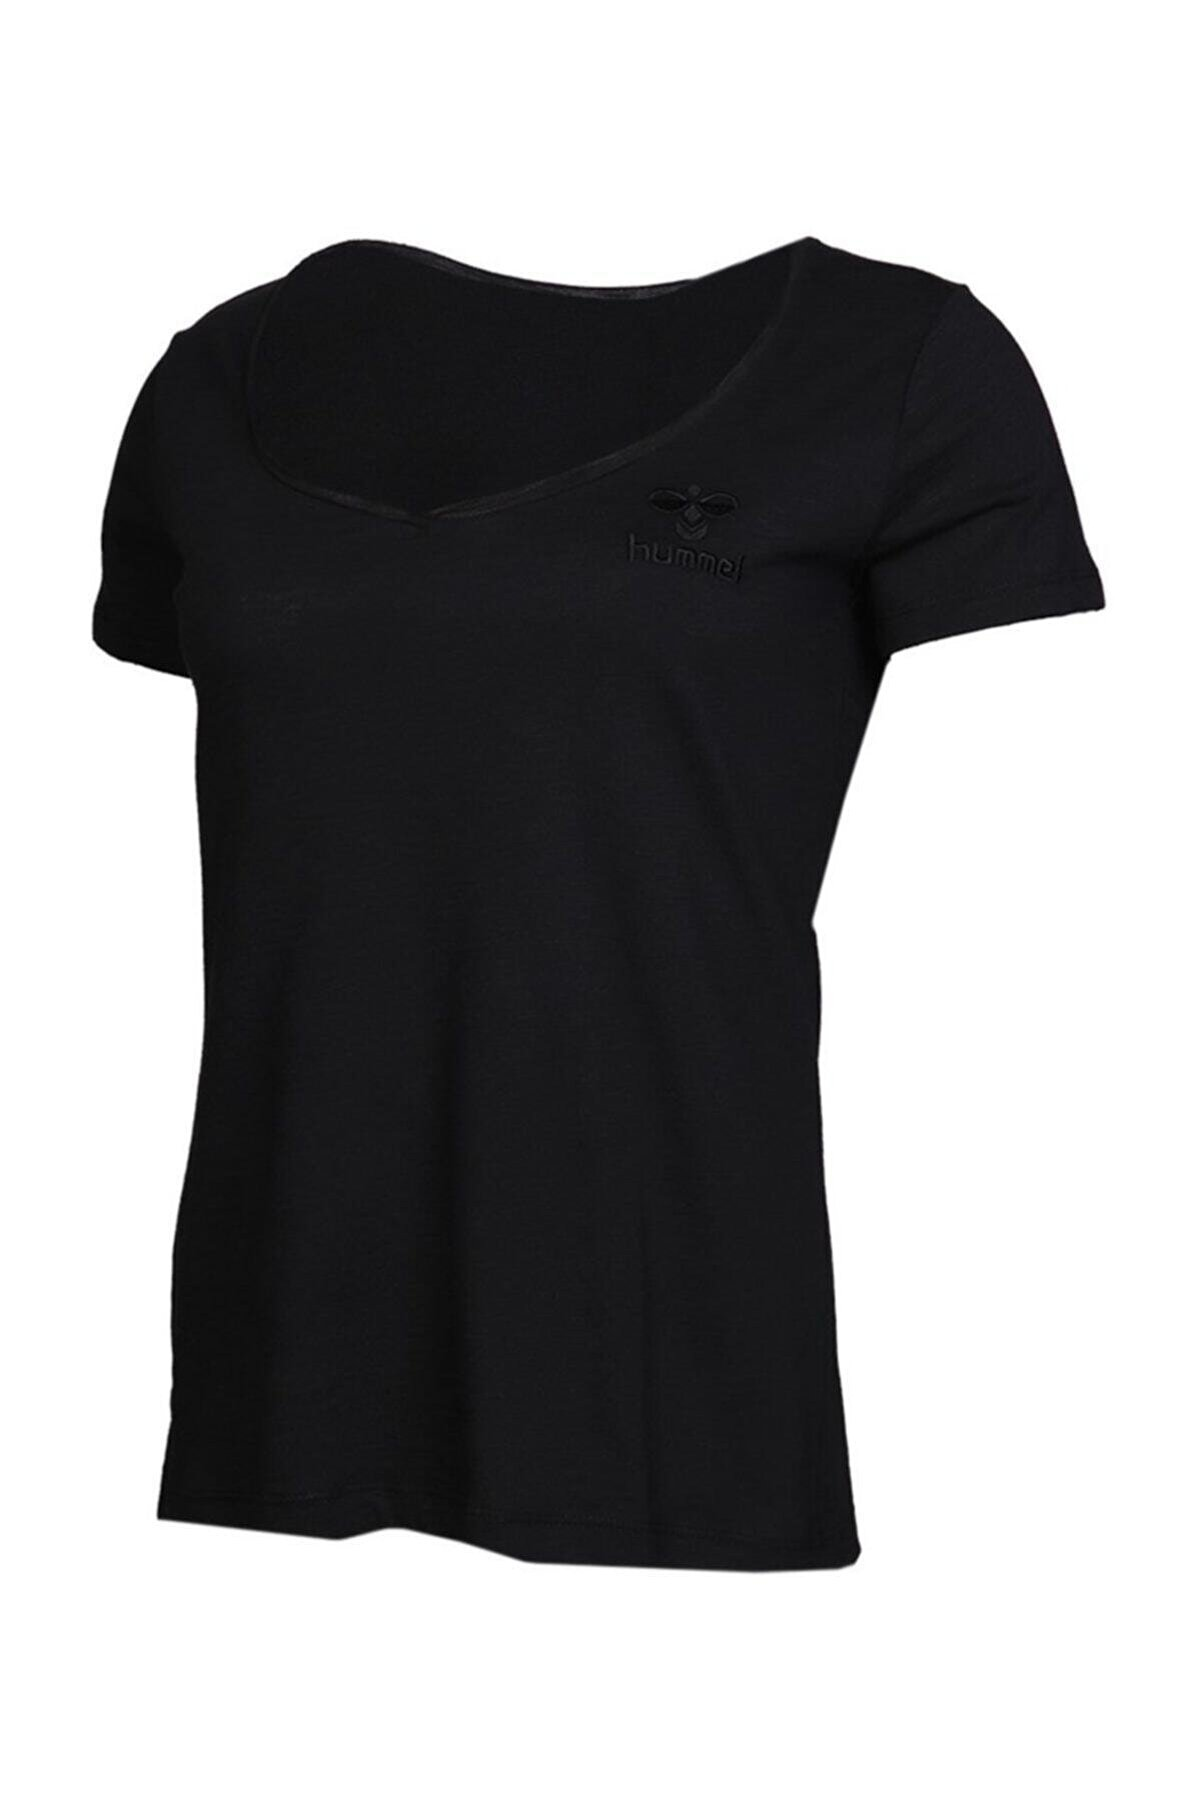 HUMMEL Alma Kadın Kısa Kollu T-Shirt